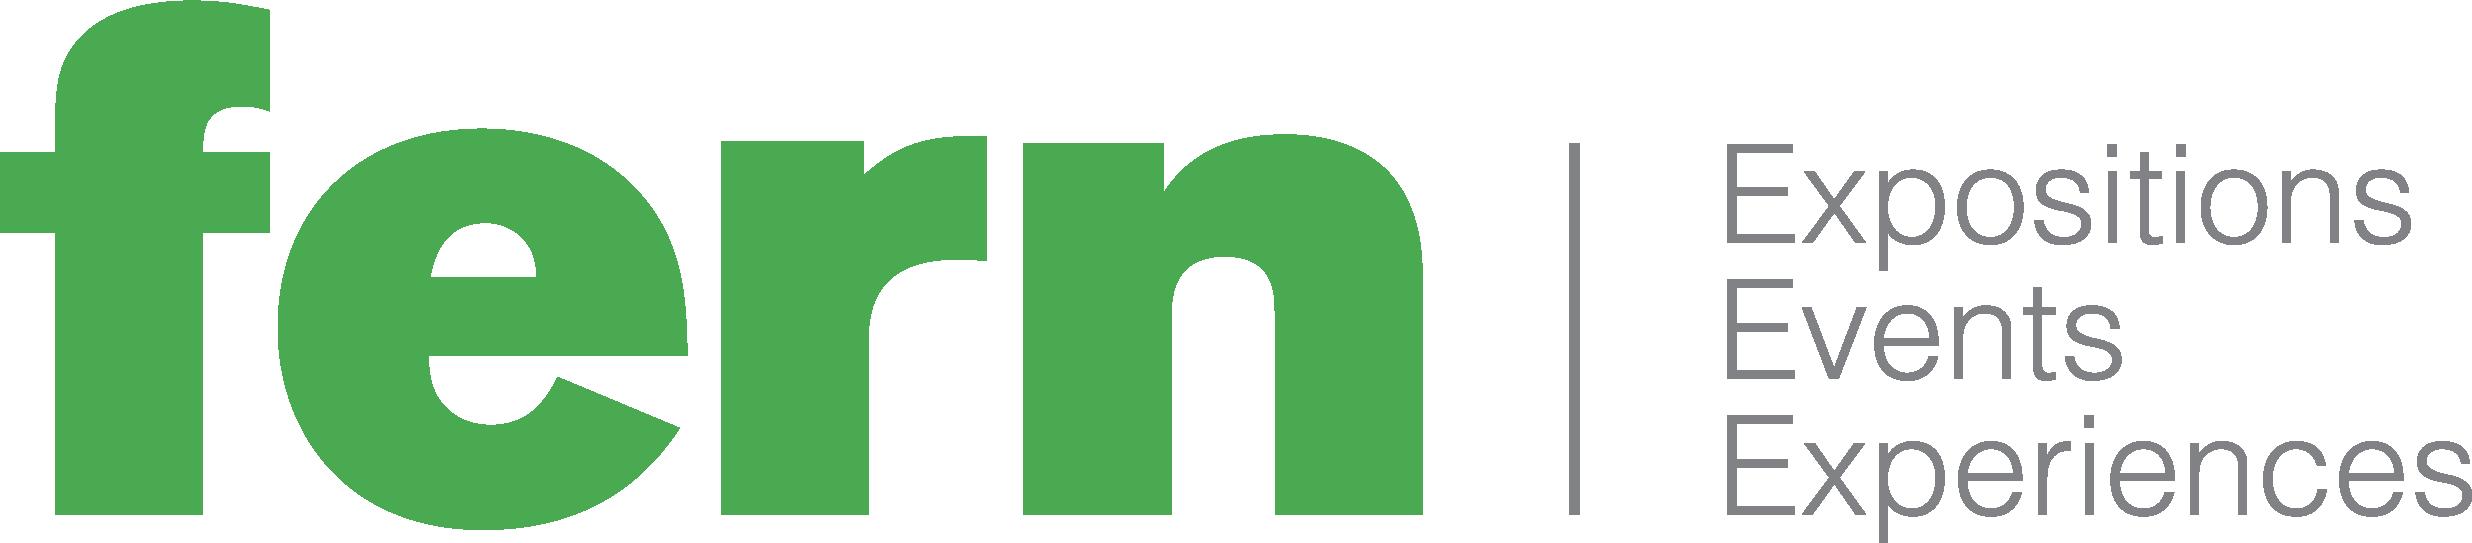 Fern_logo_expo_cmyk.png